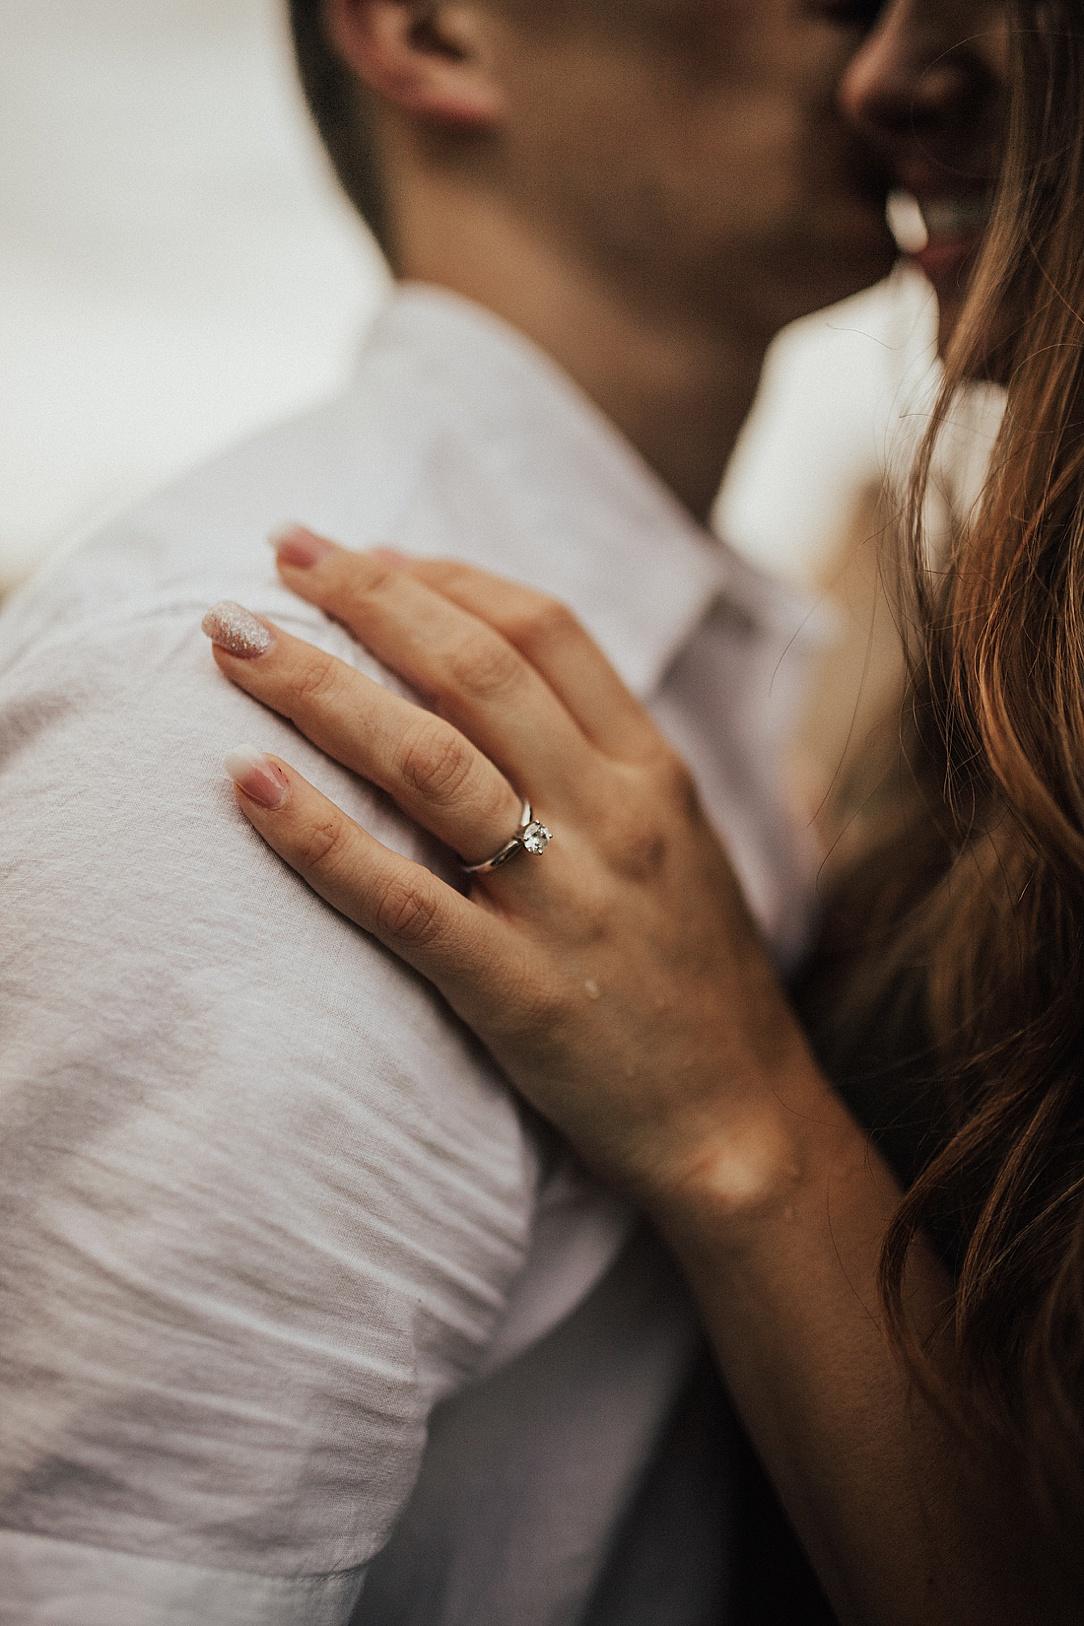 Verlovingsring aan hand